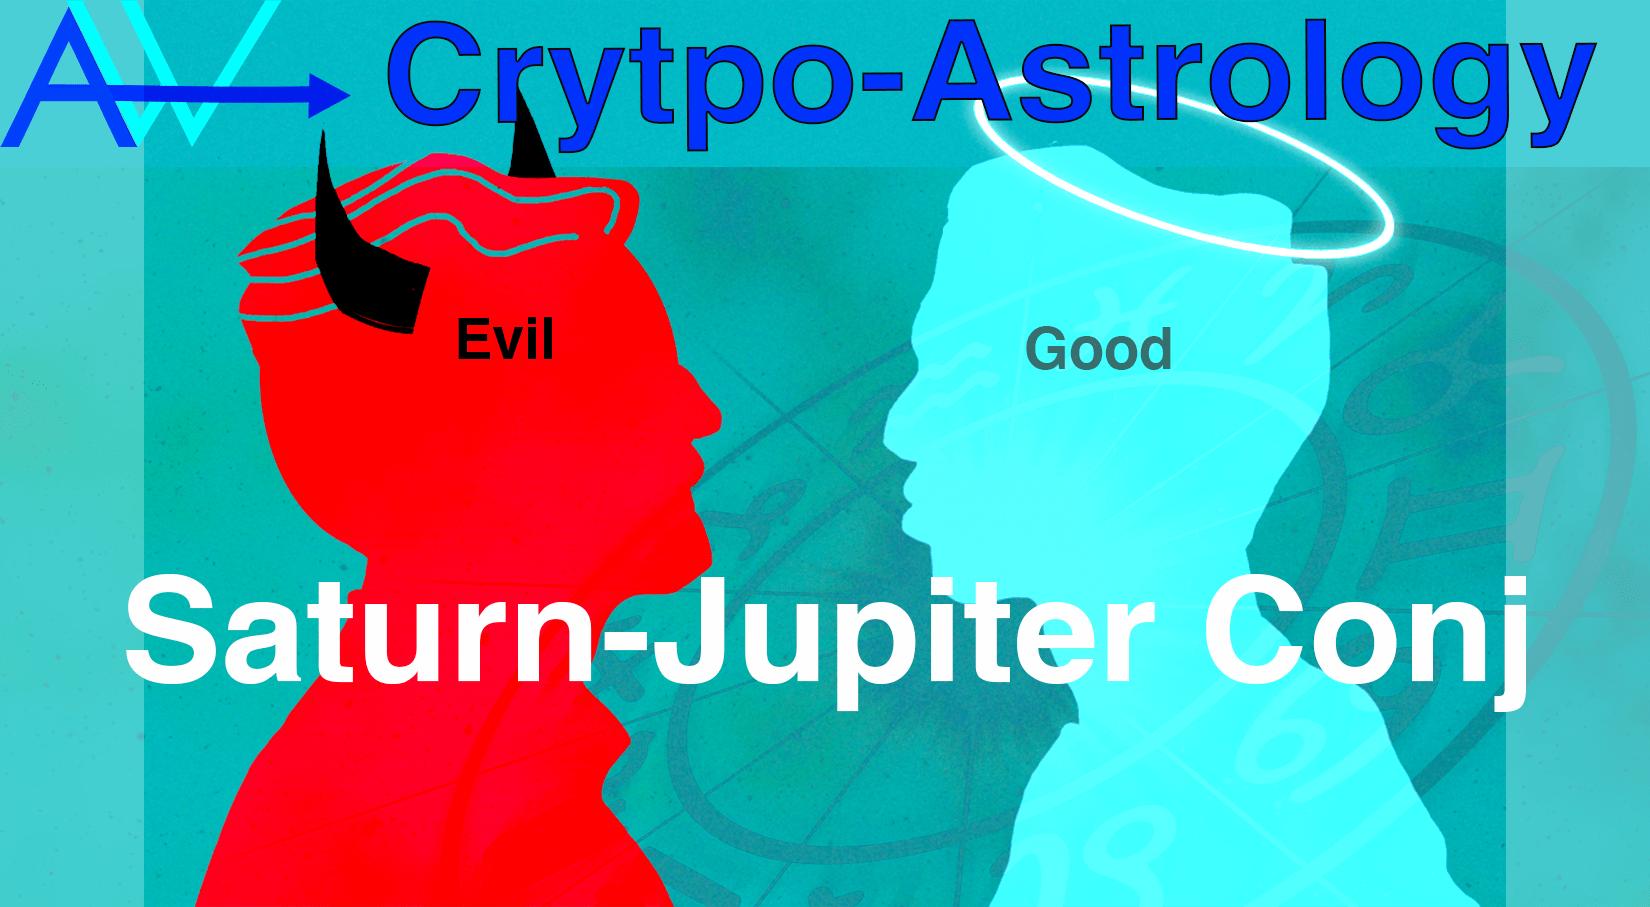 You are currently viewing Good v Evil – Saturn Jupiter Conjunction<br><span style='color:#00adee;font-size:.8em'>Good Vs Evil </span>